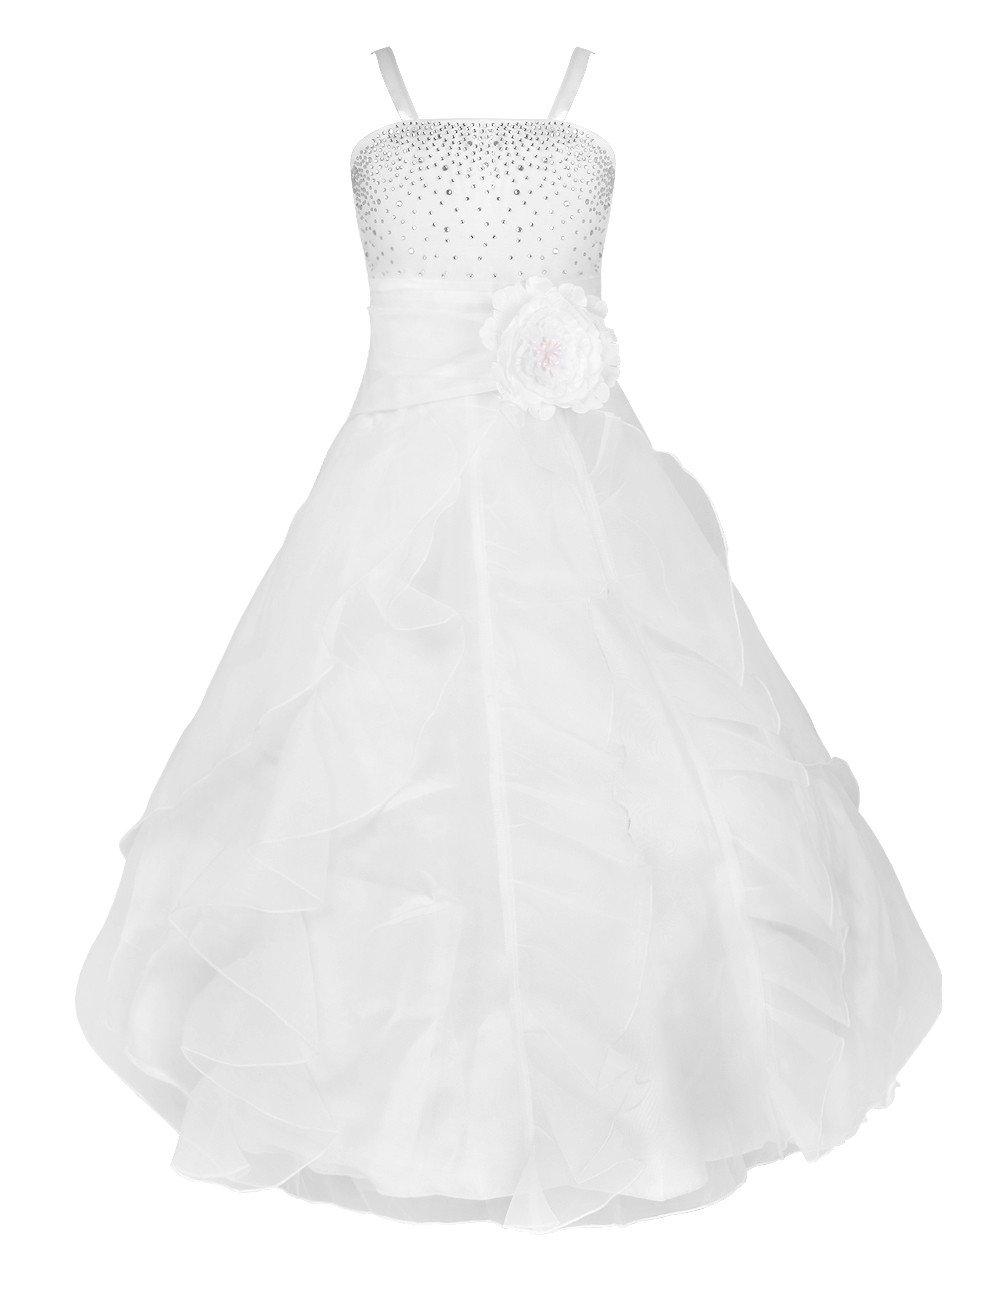 YiZYiF Kids Big Girls Flower Party Wedding Gown Bridesmaid Organza Ruffle Dress White 10